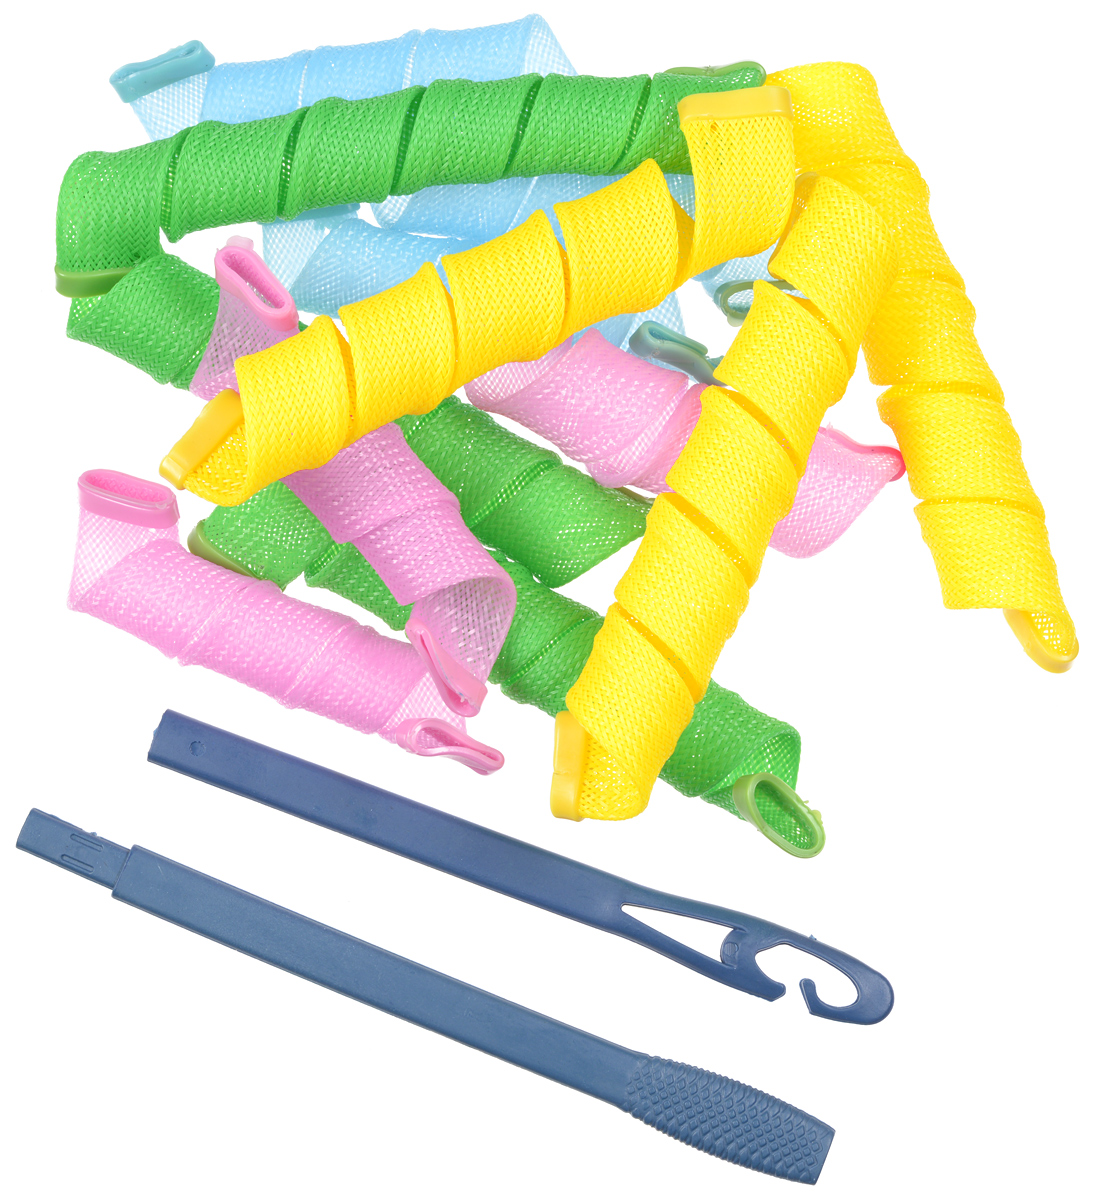 Magic Leverag Бигуди широкие, 6 х 29 см, 6 х 44 см magic leverag бигуди широкие 6 х 29 см 6 х 44 см